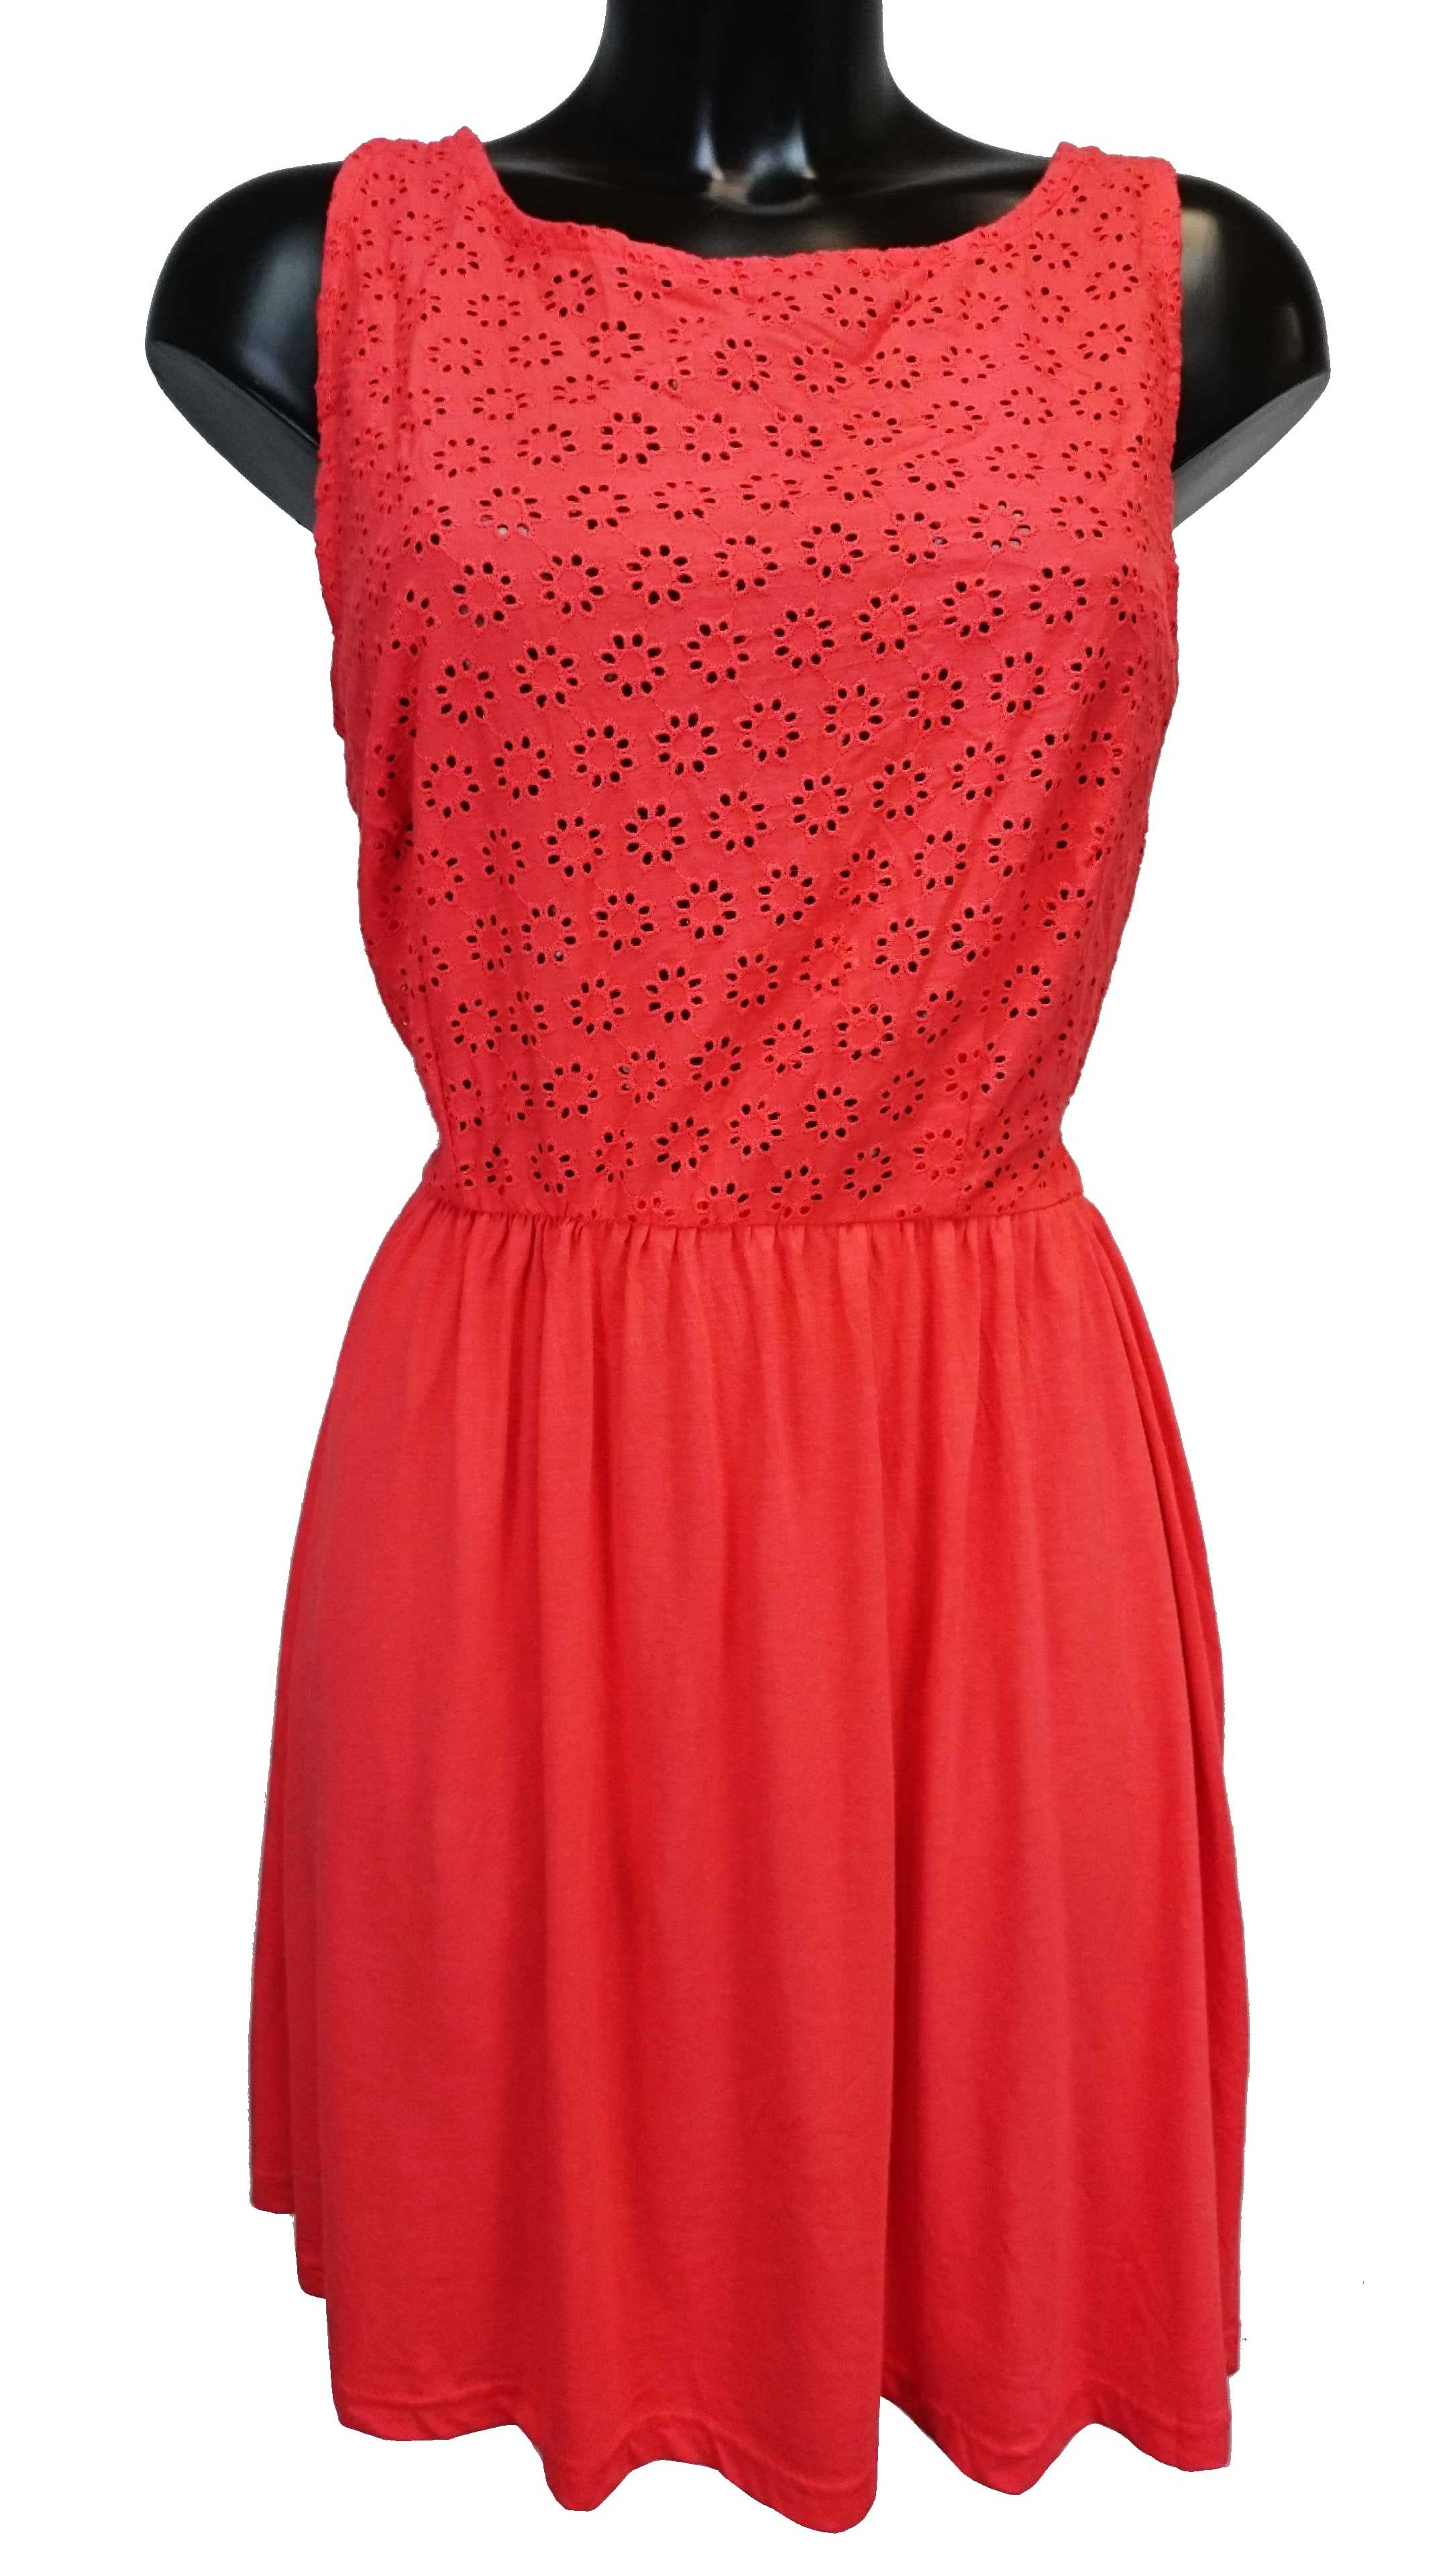 efd3bc9d98e5 ATMOSPHERE dámské oranžové šaty - Glami.cz